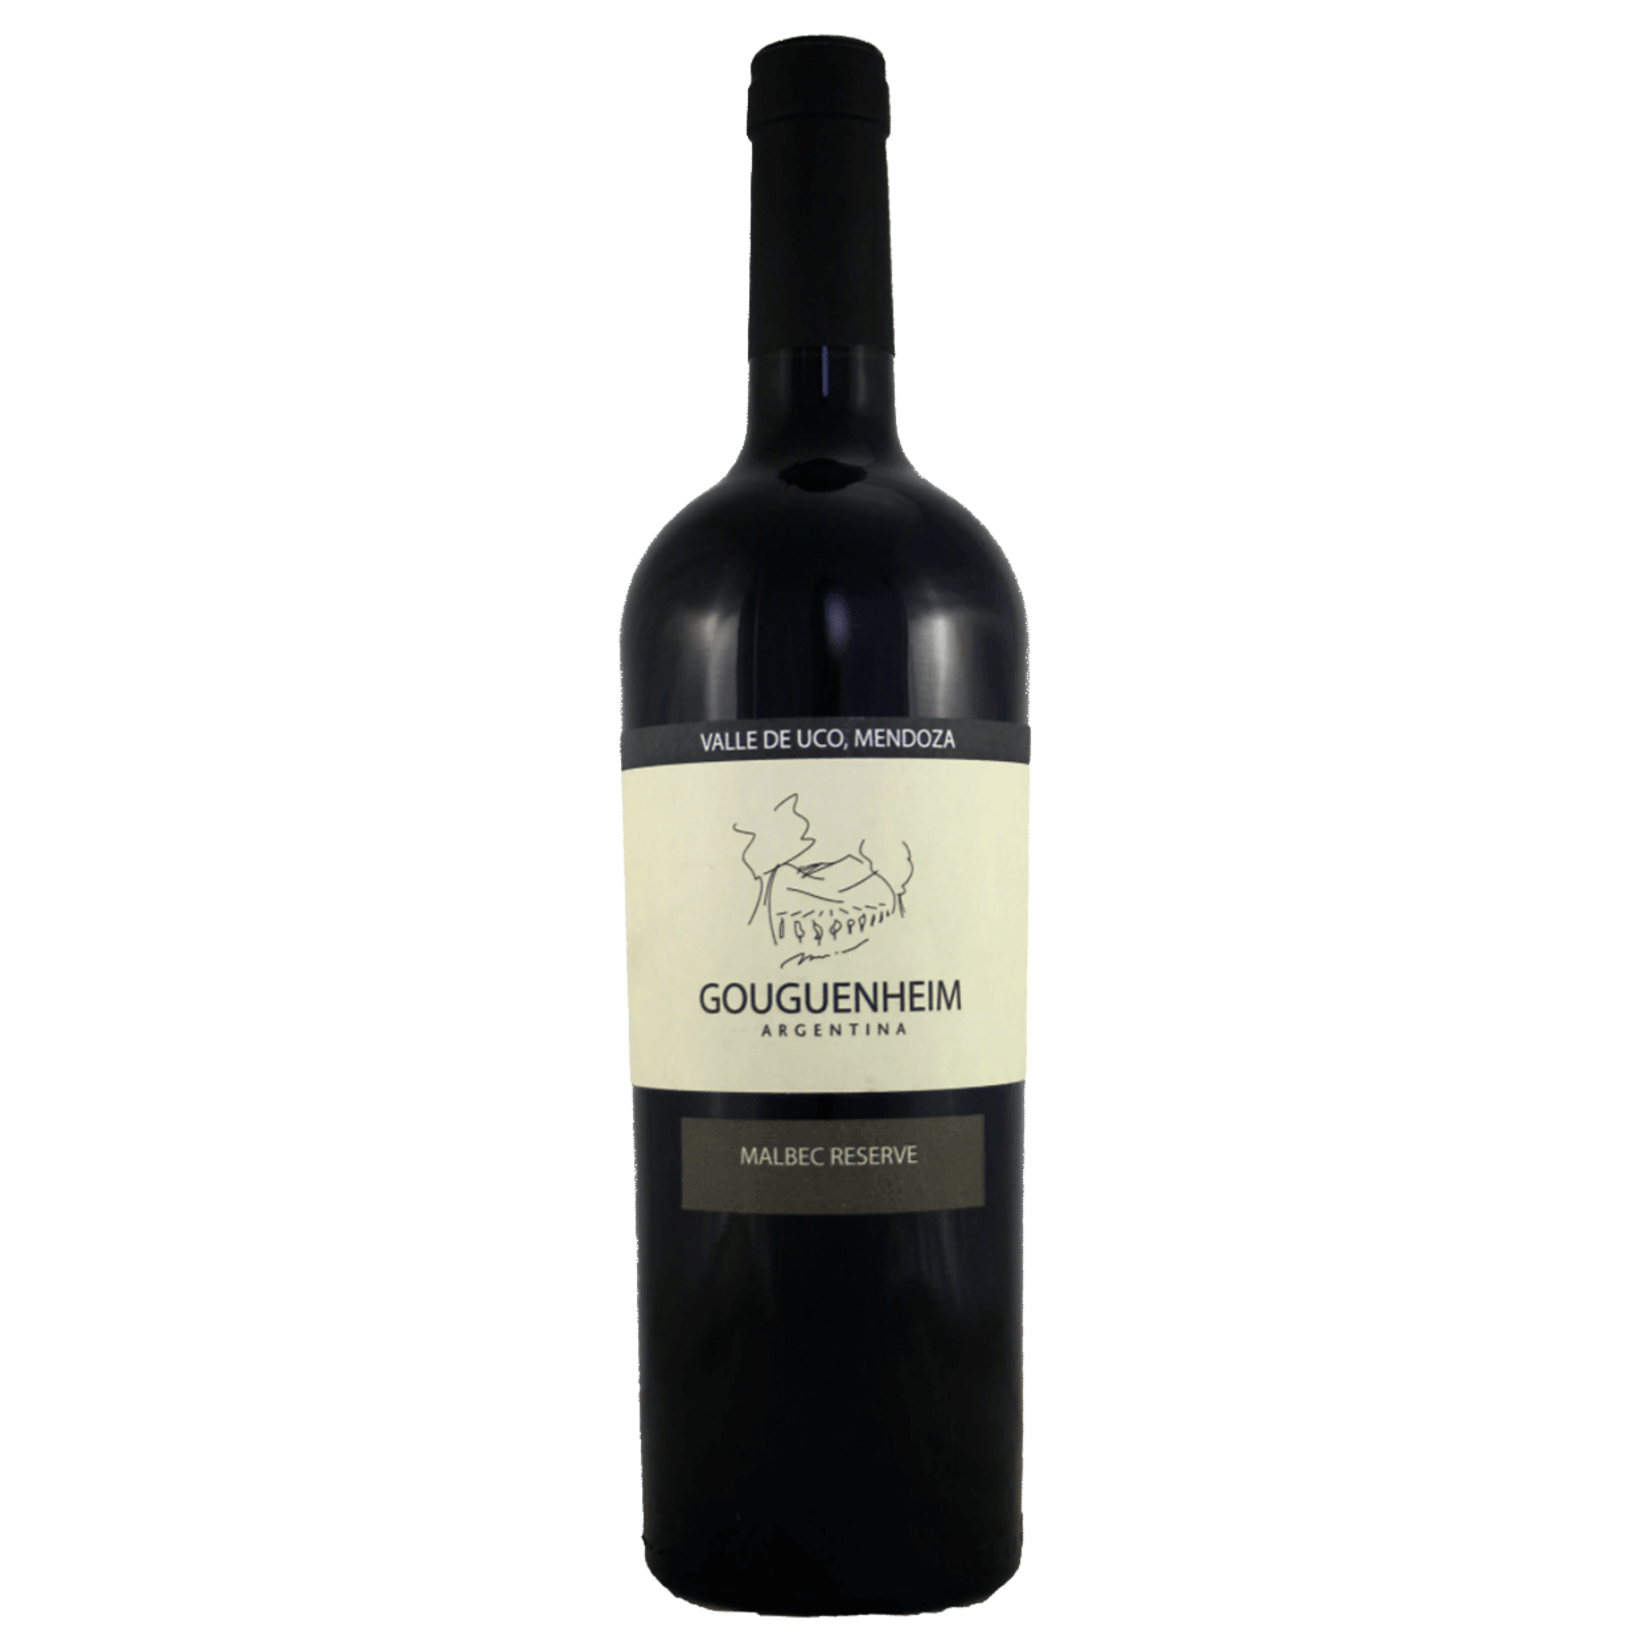 Wine Gougenheim Mendoza Malbec Reserve 2018